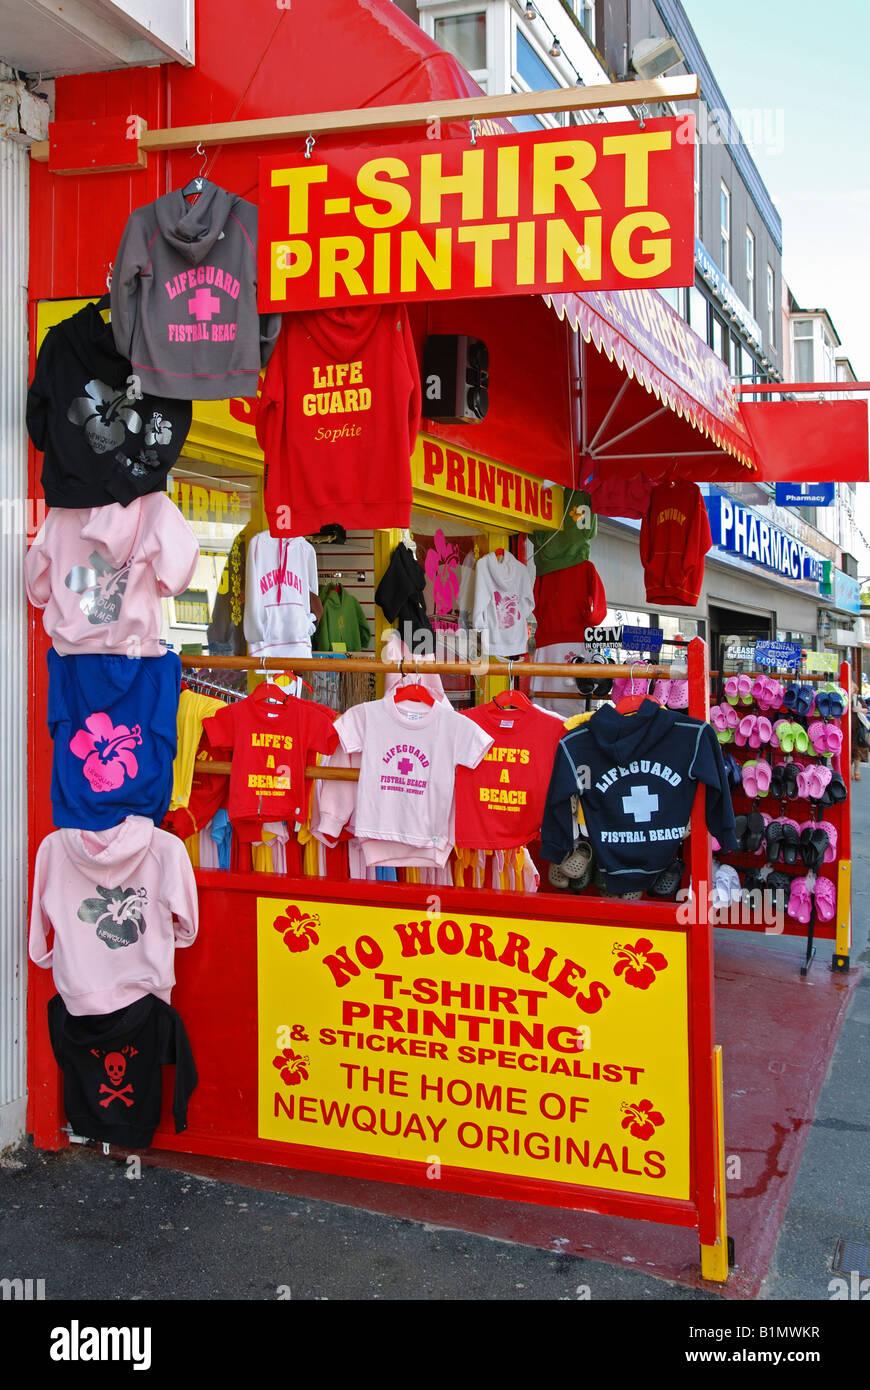 a t-shirt printing shop at newquay in cornwall,england Stock Photo